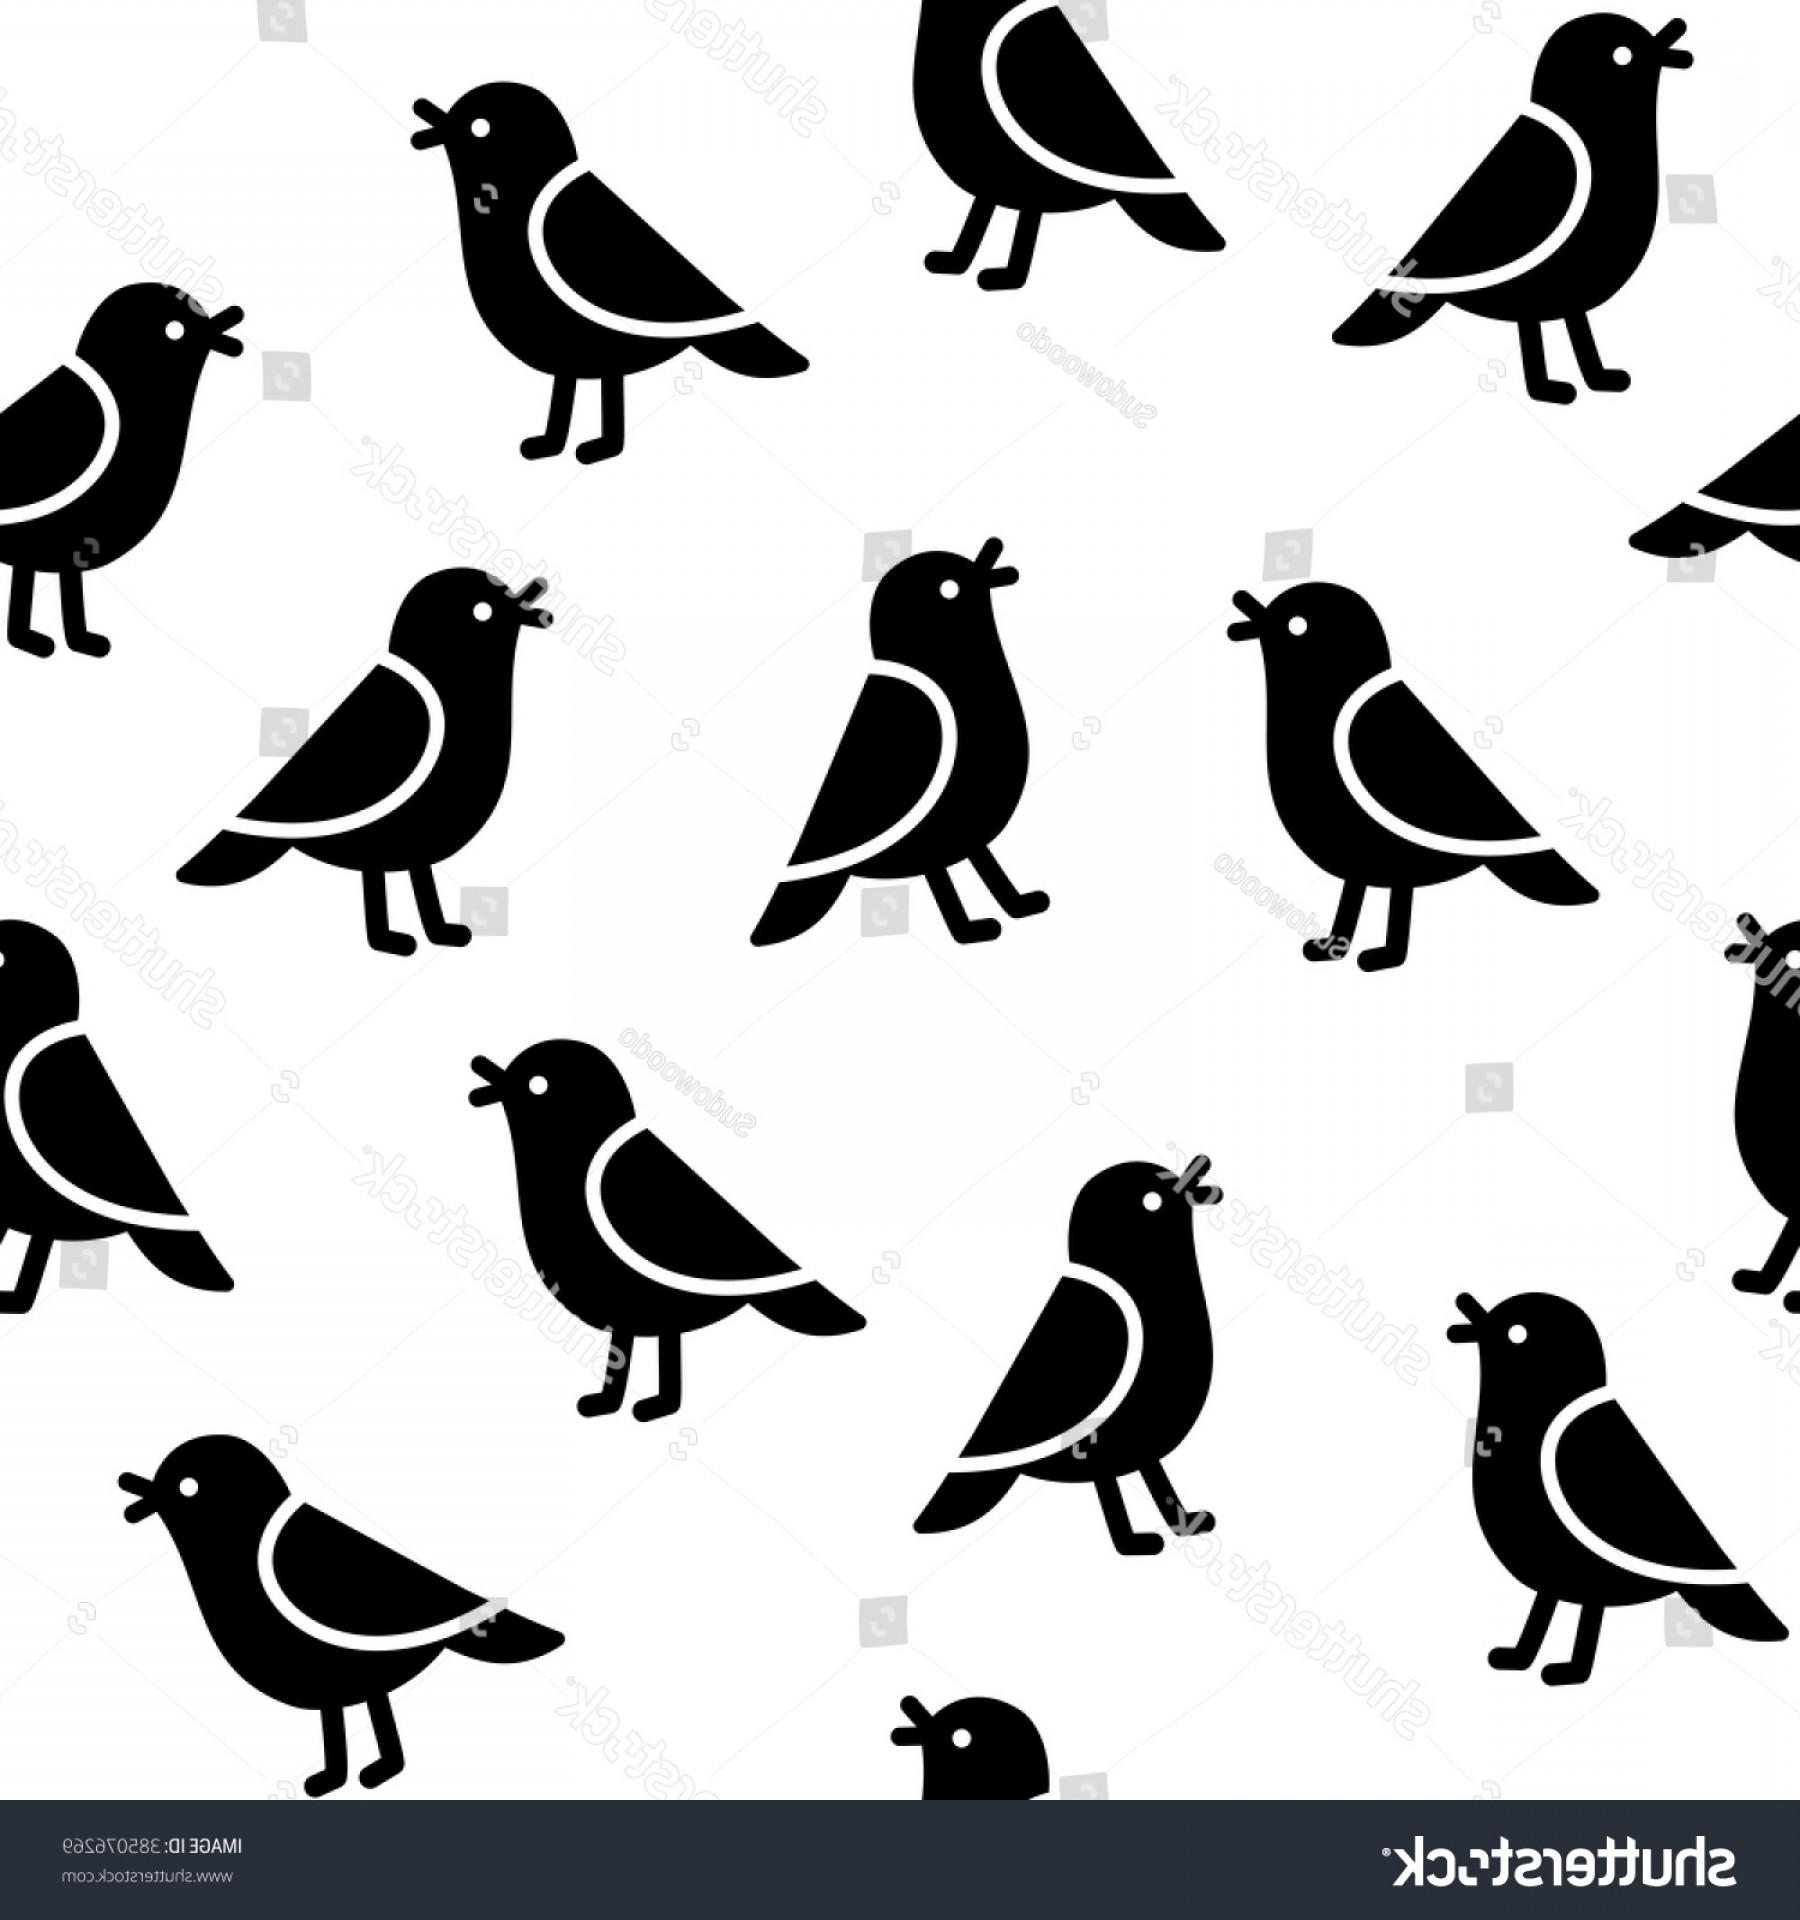 1800x1920 Seamless Birds Pattern Simple Cartoon Vector Shopatcloth